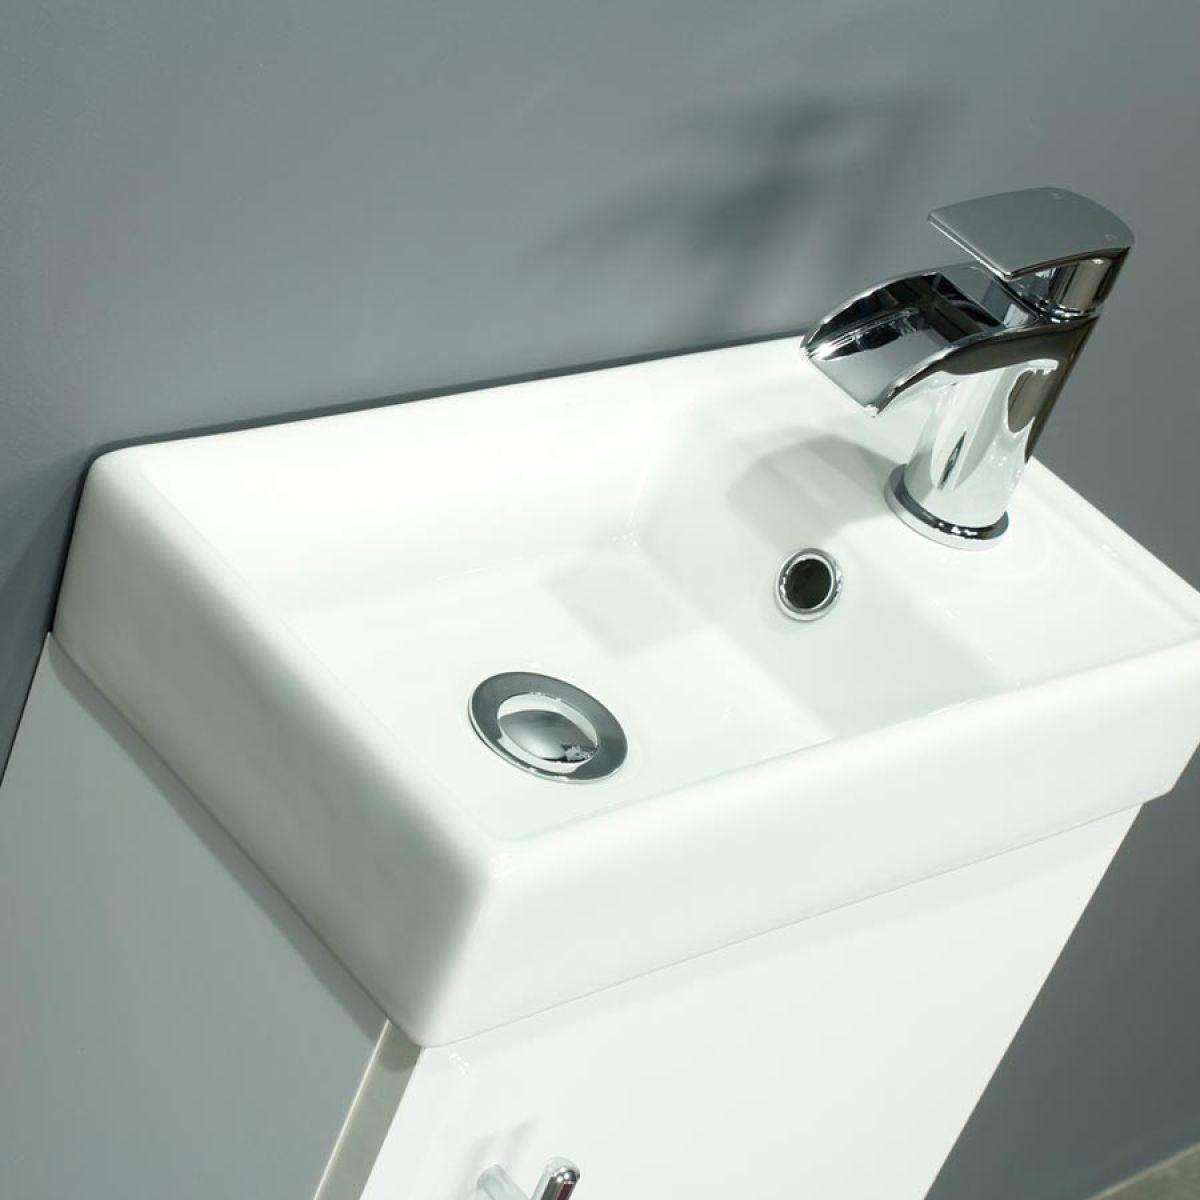 RAK Series 600 Back To Wall Toilet and 400 Series Gloss White Vanity Unit Basin